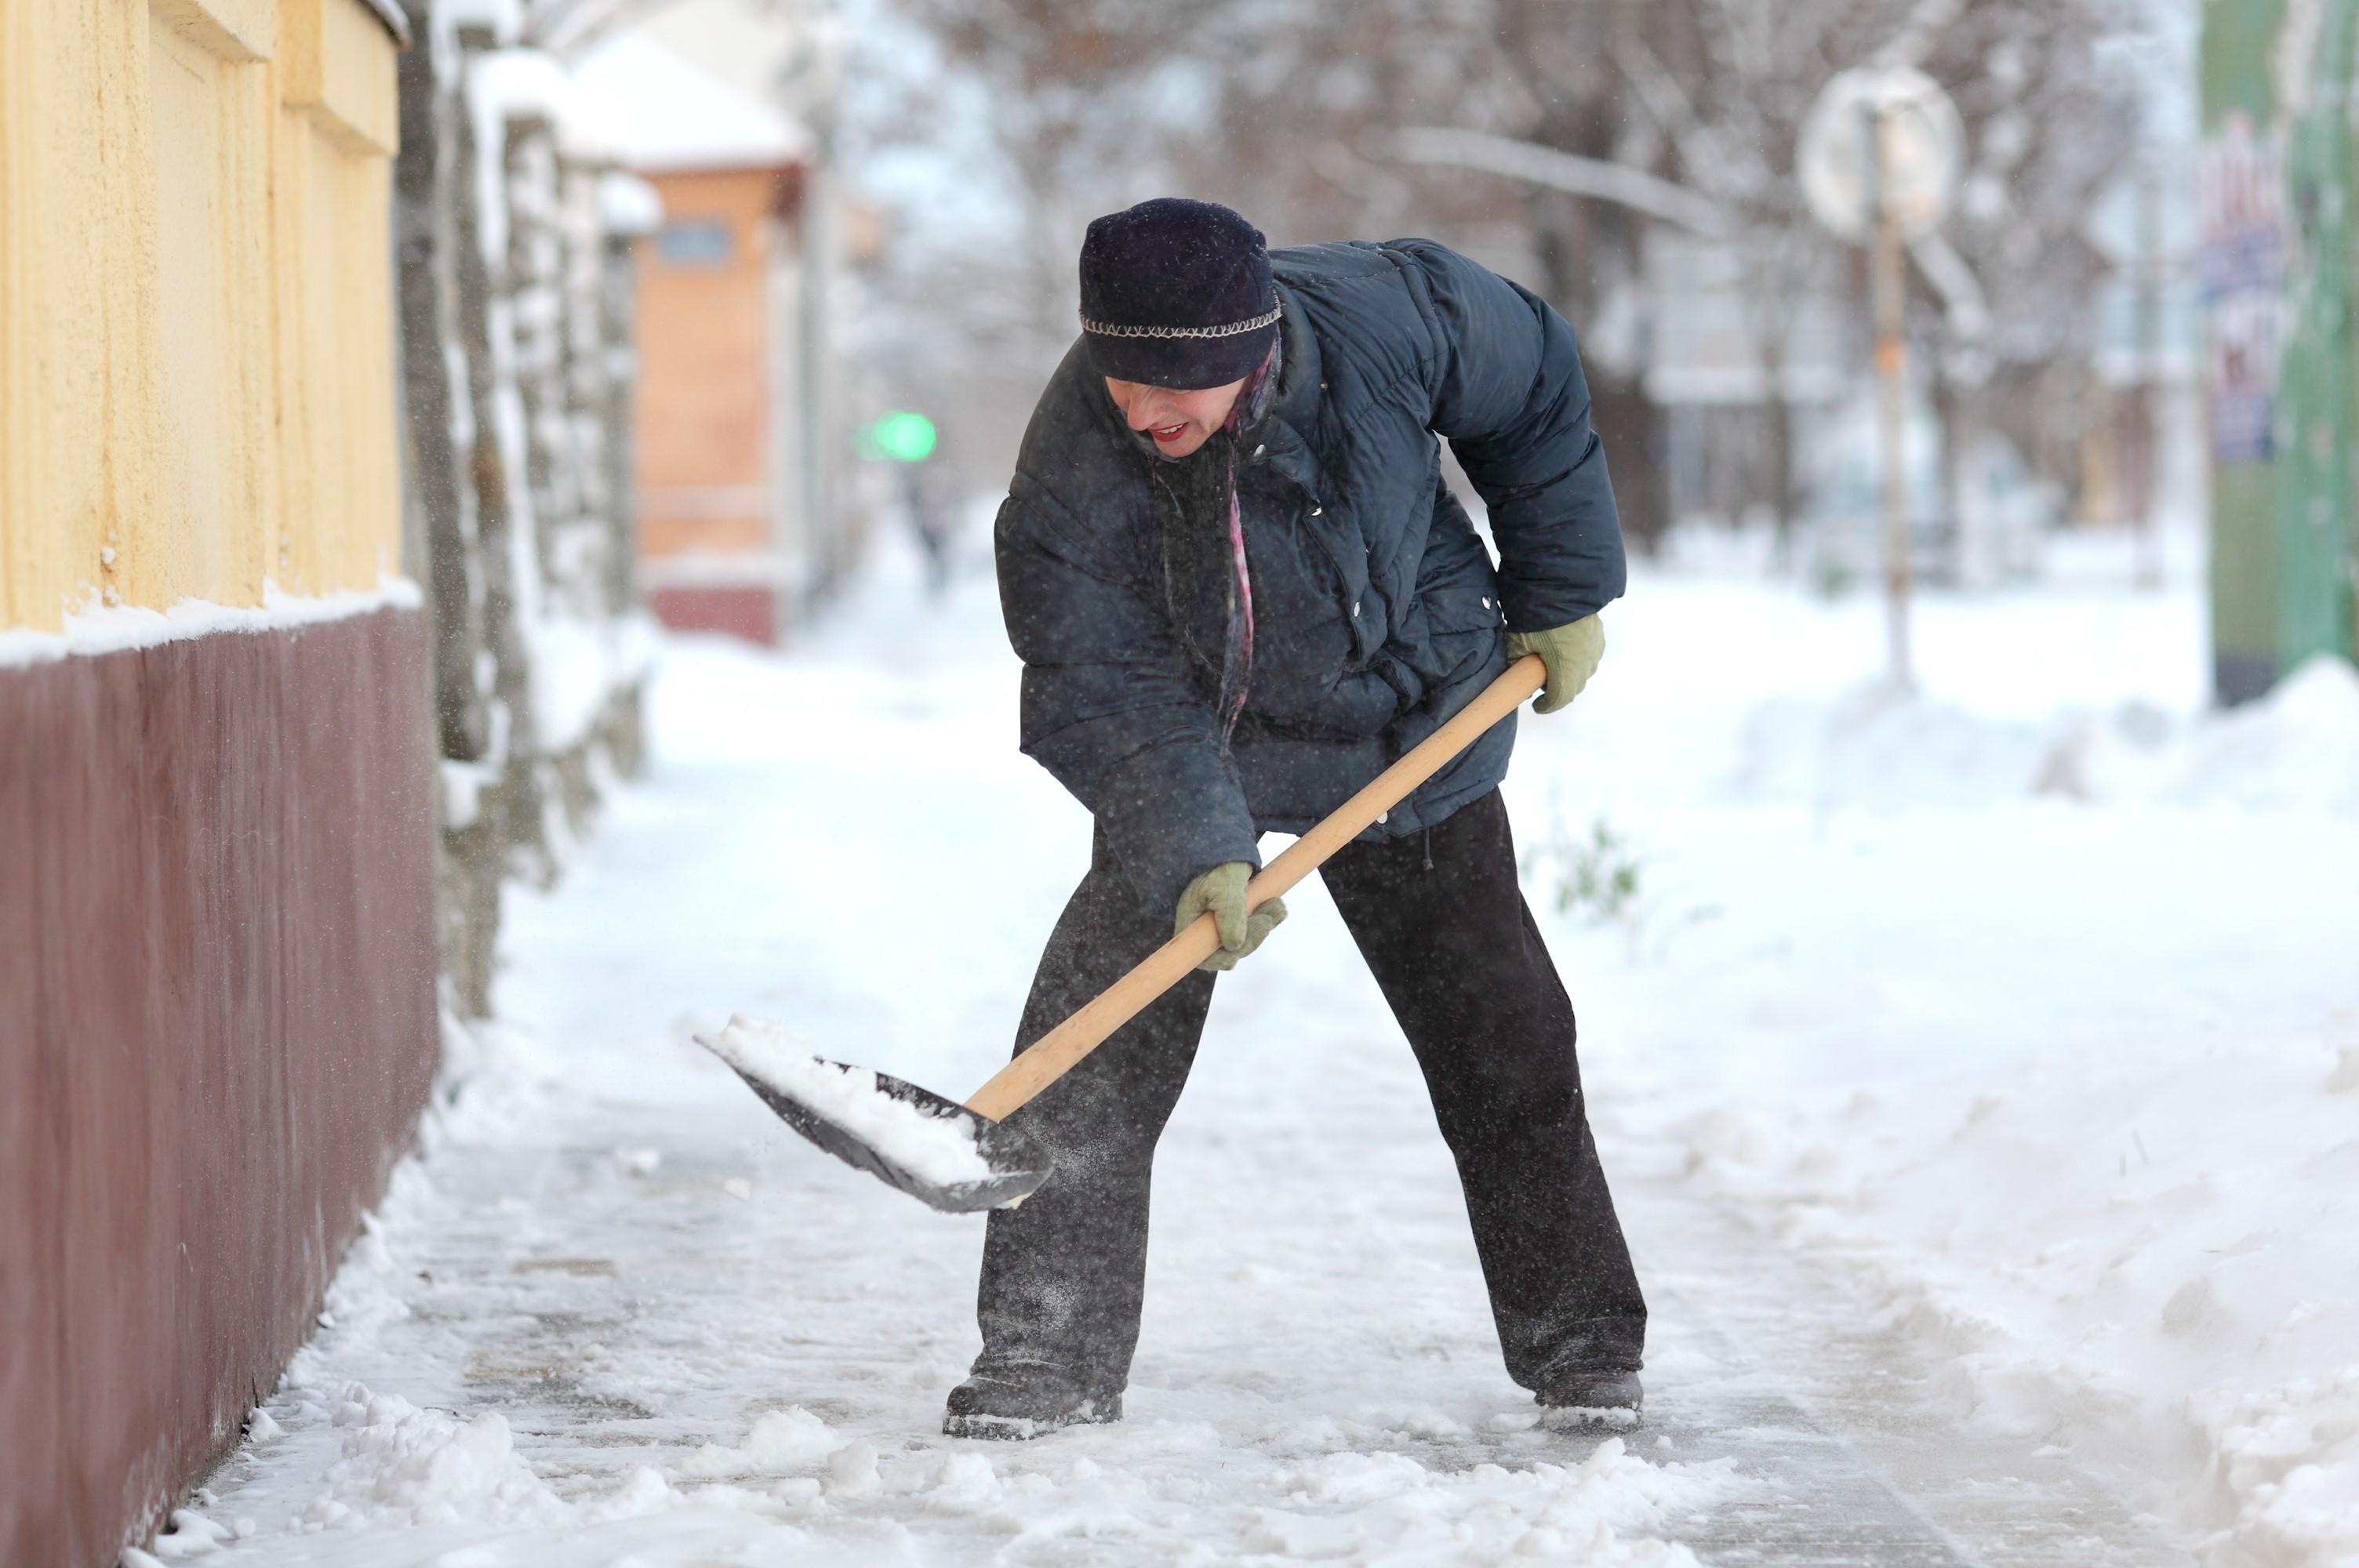 Shoveling Snow? Be Careful!